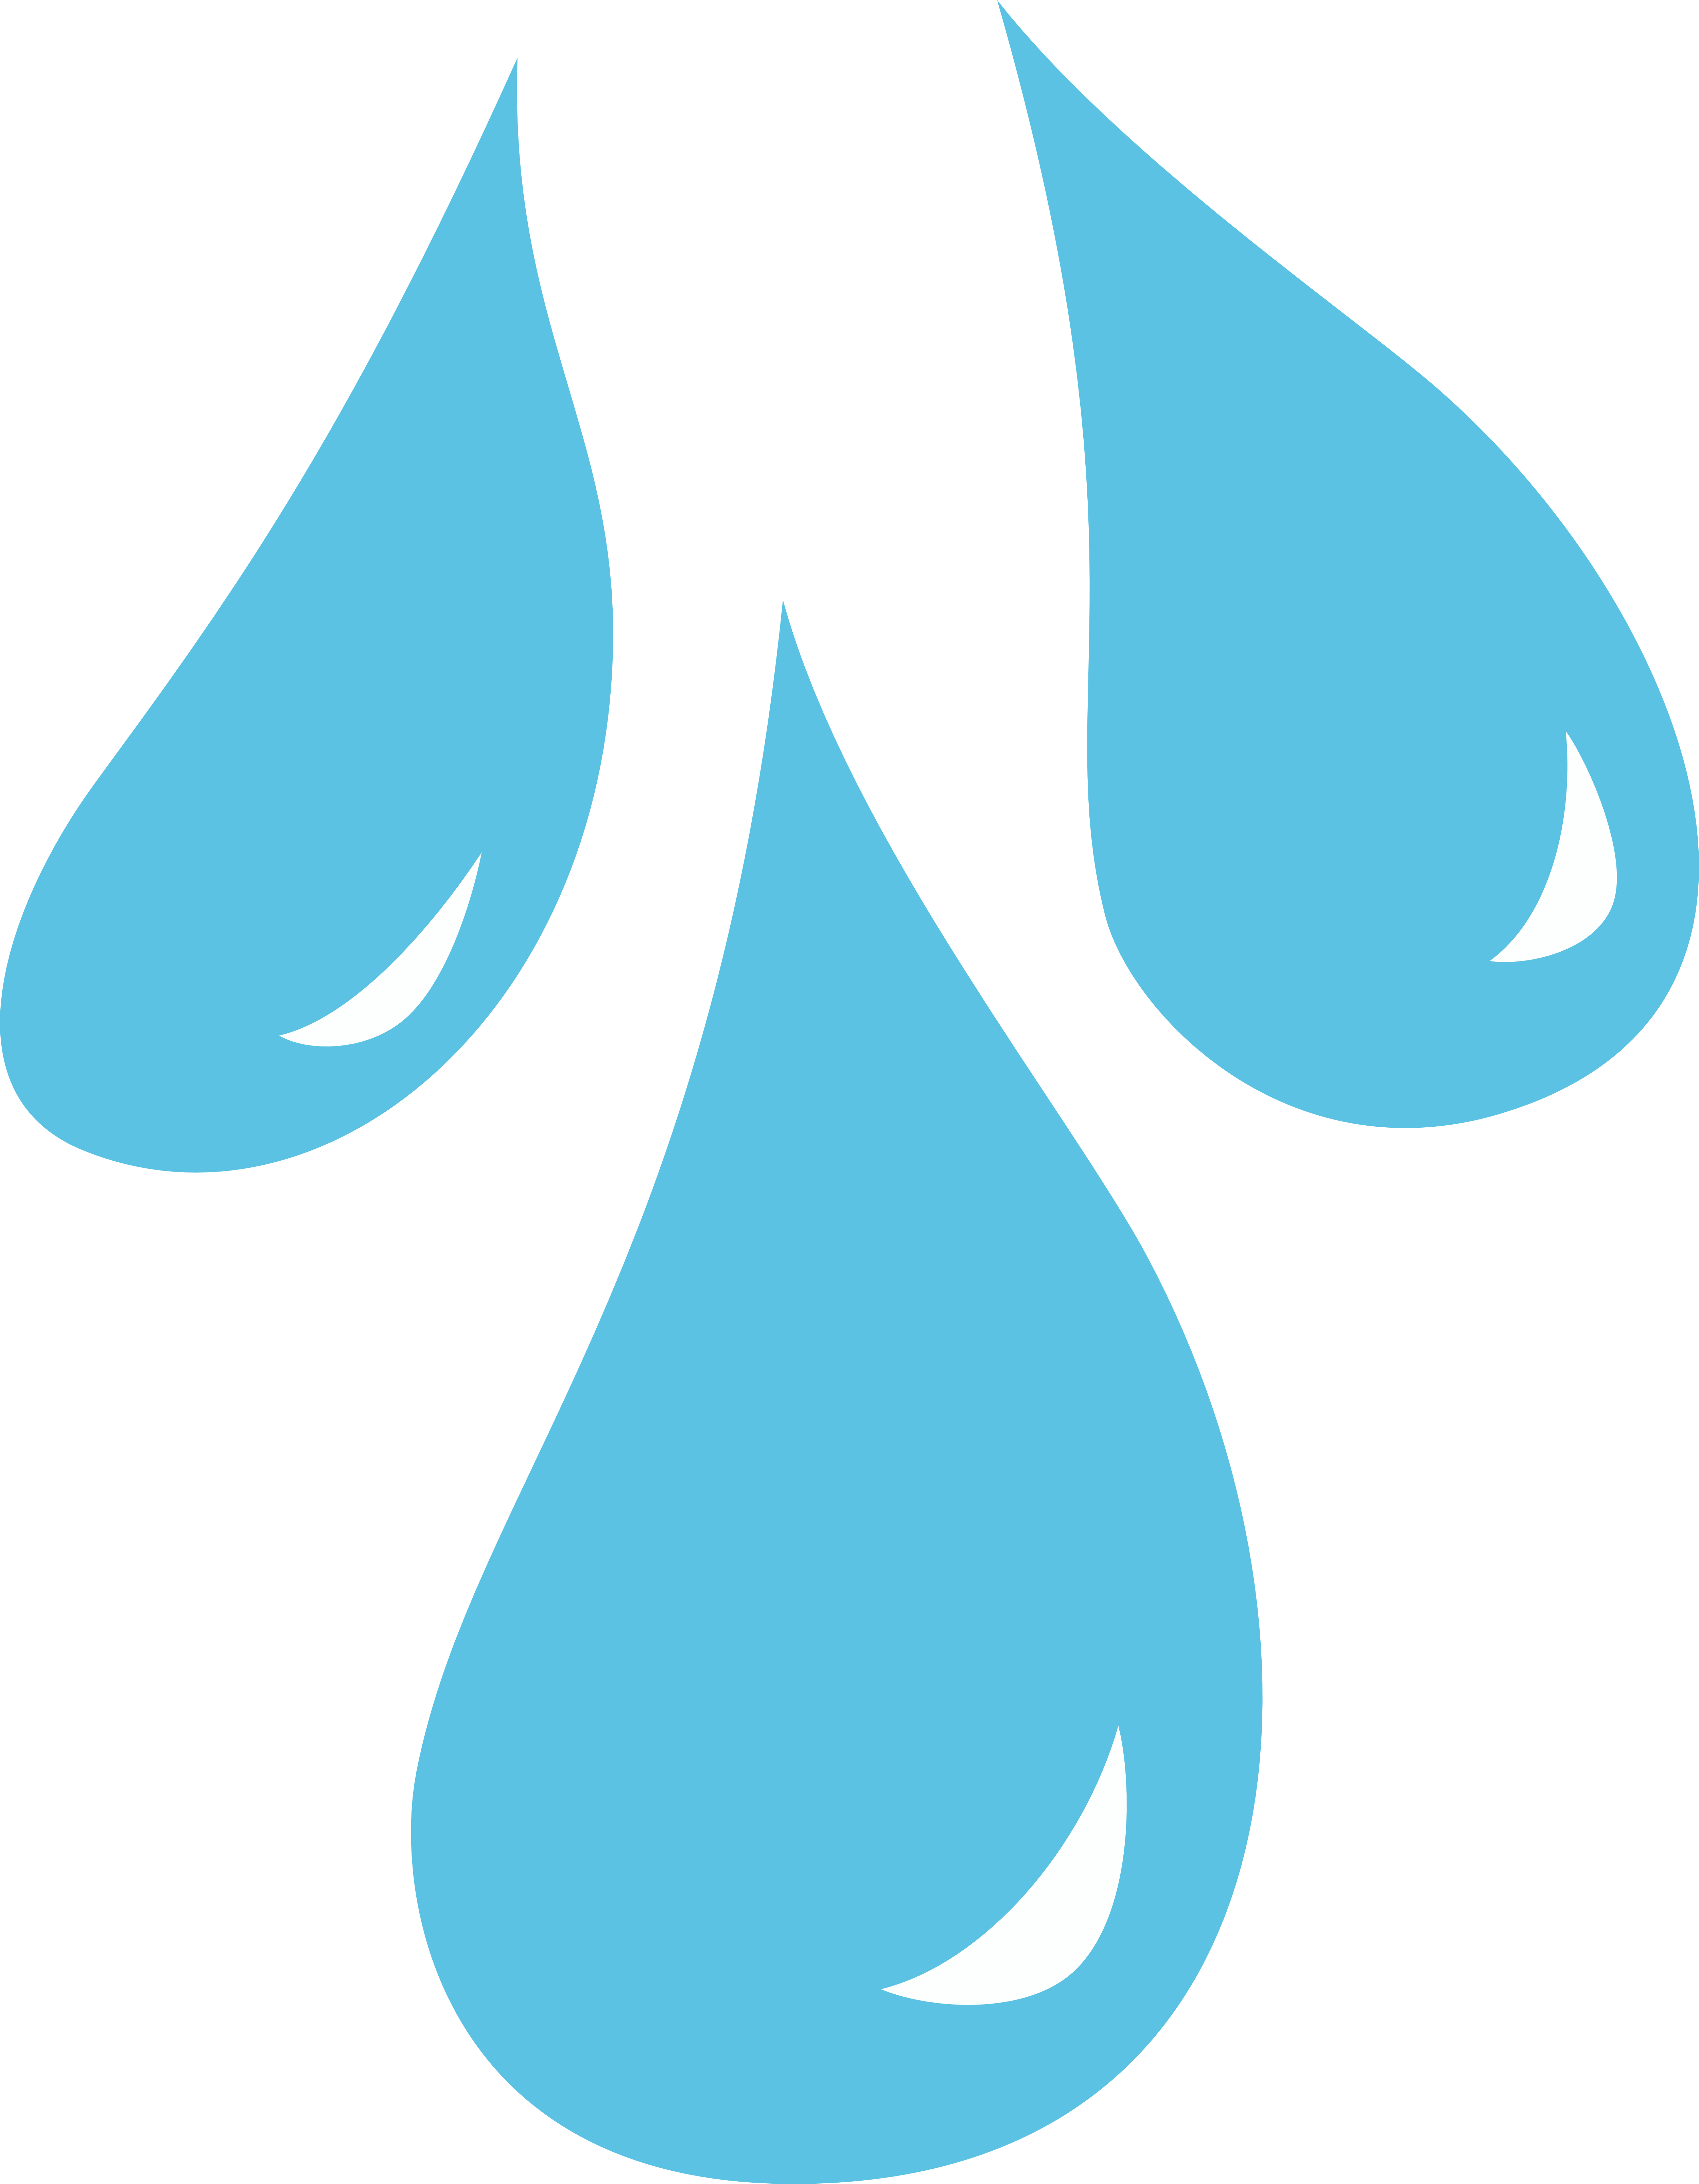 Panda free images rain. Raindrop clipart